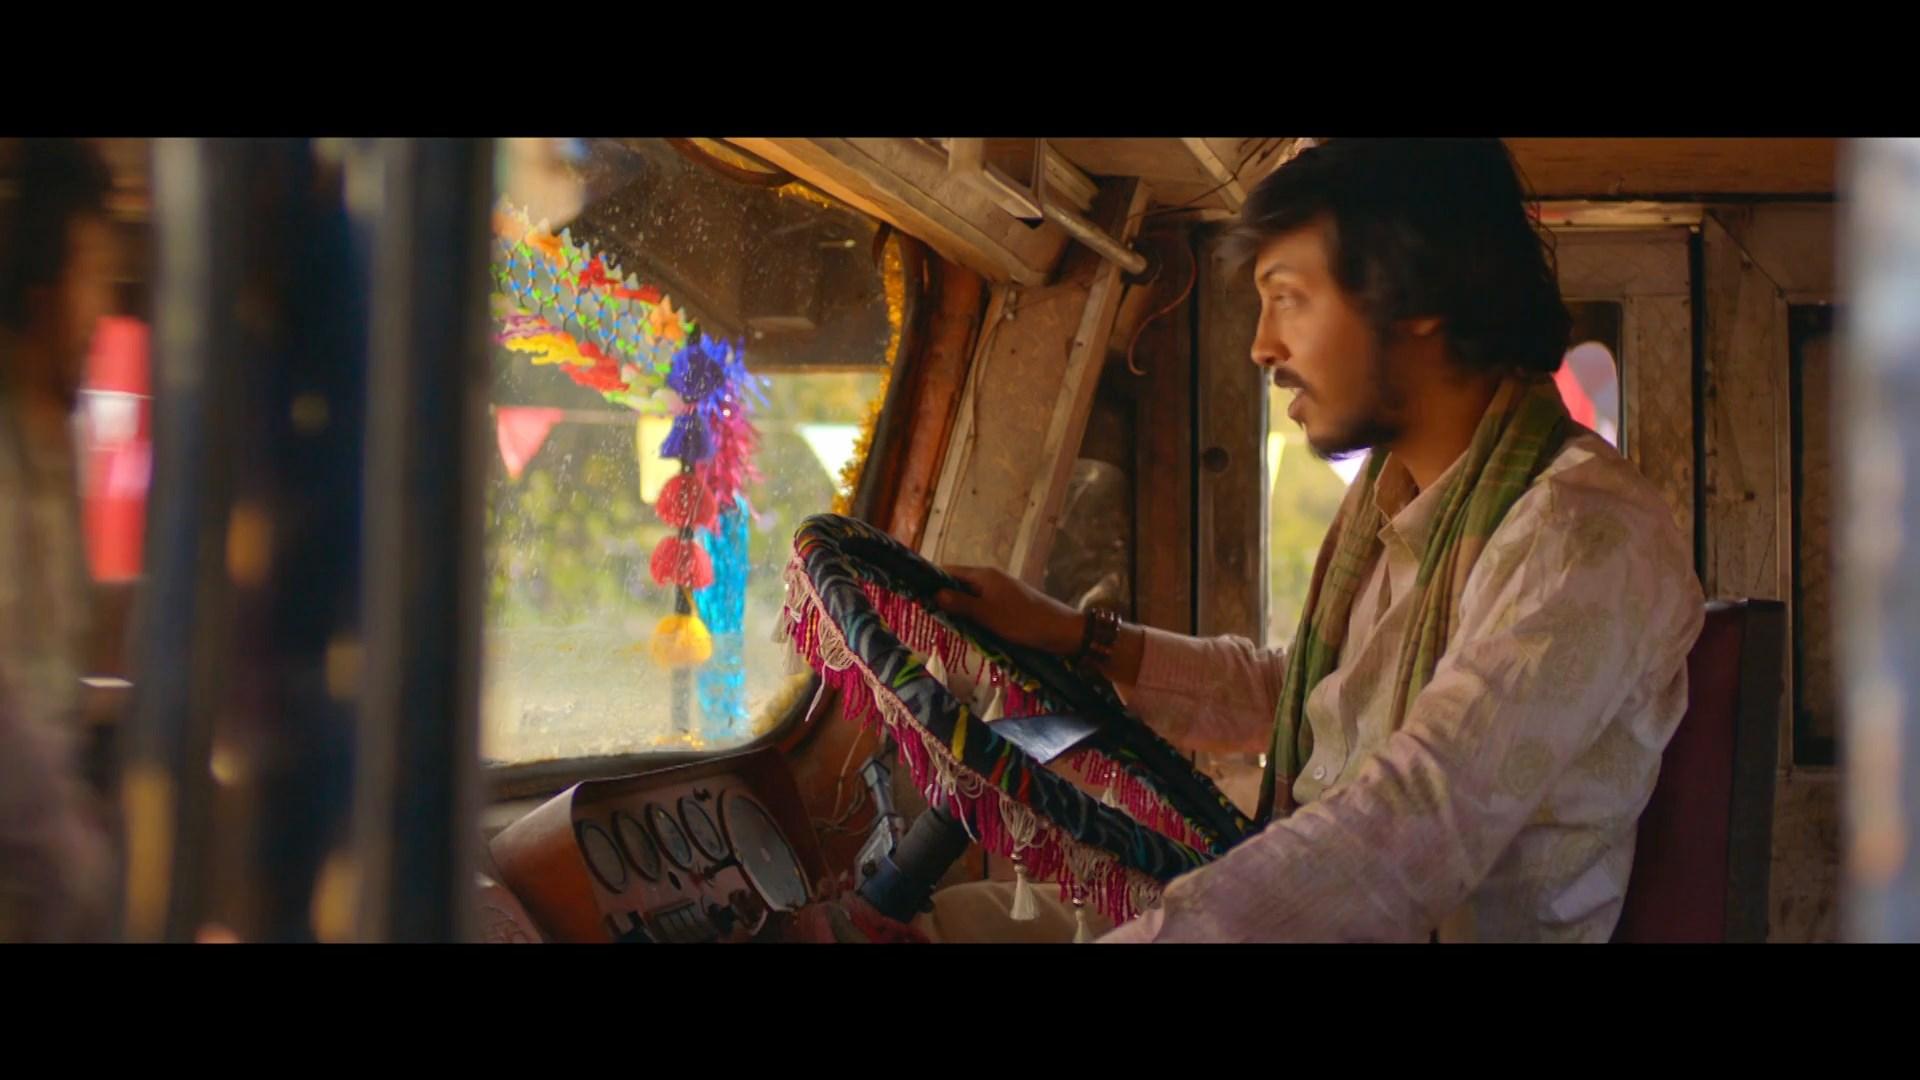 Uronchondi.2018.Bengali.1080p.WEB.DL.AVC.AAC.DUS.ICTV.mkv snapshot 01.34.30.000